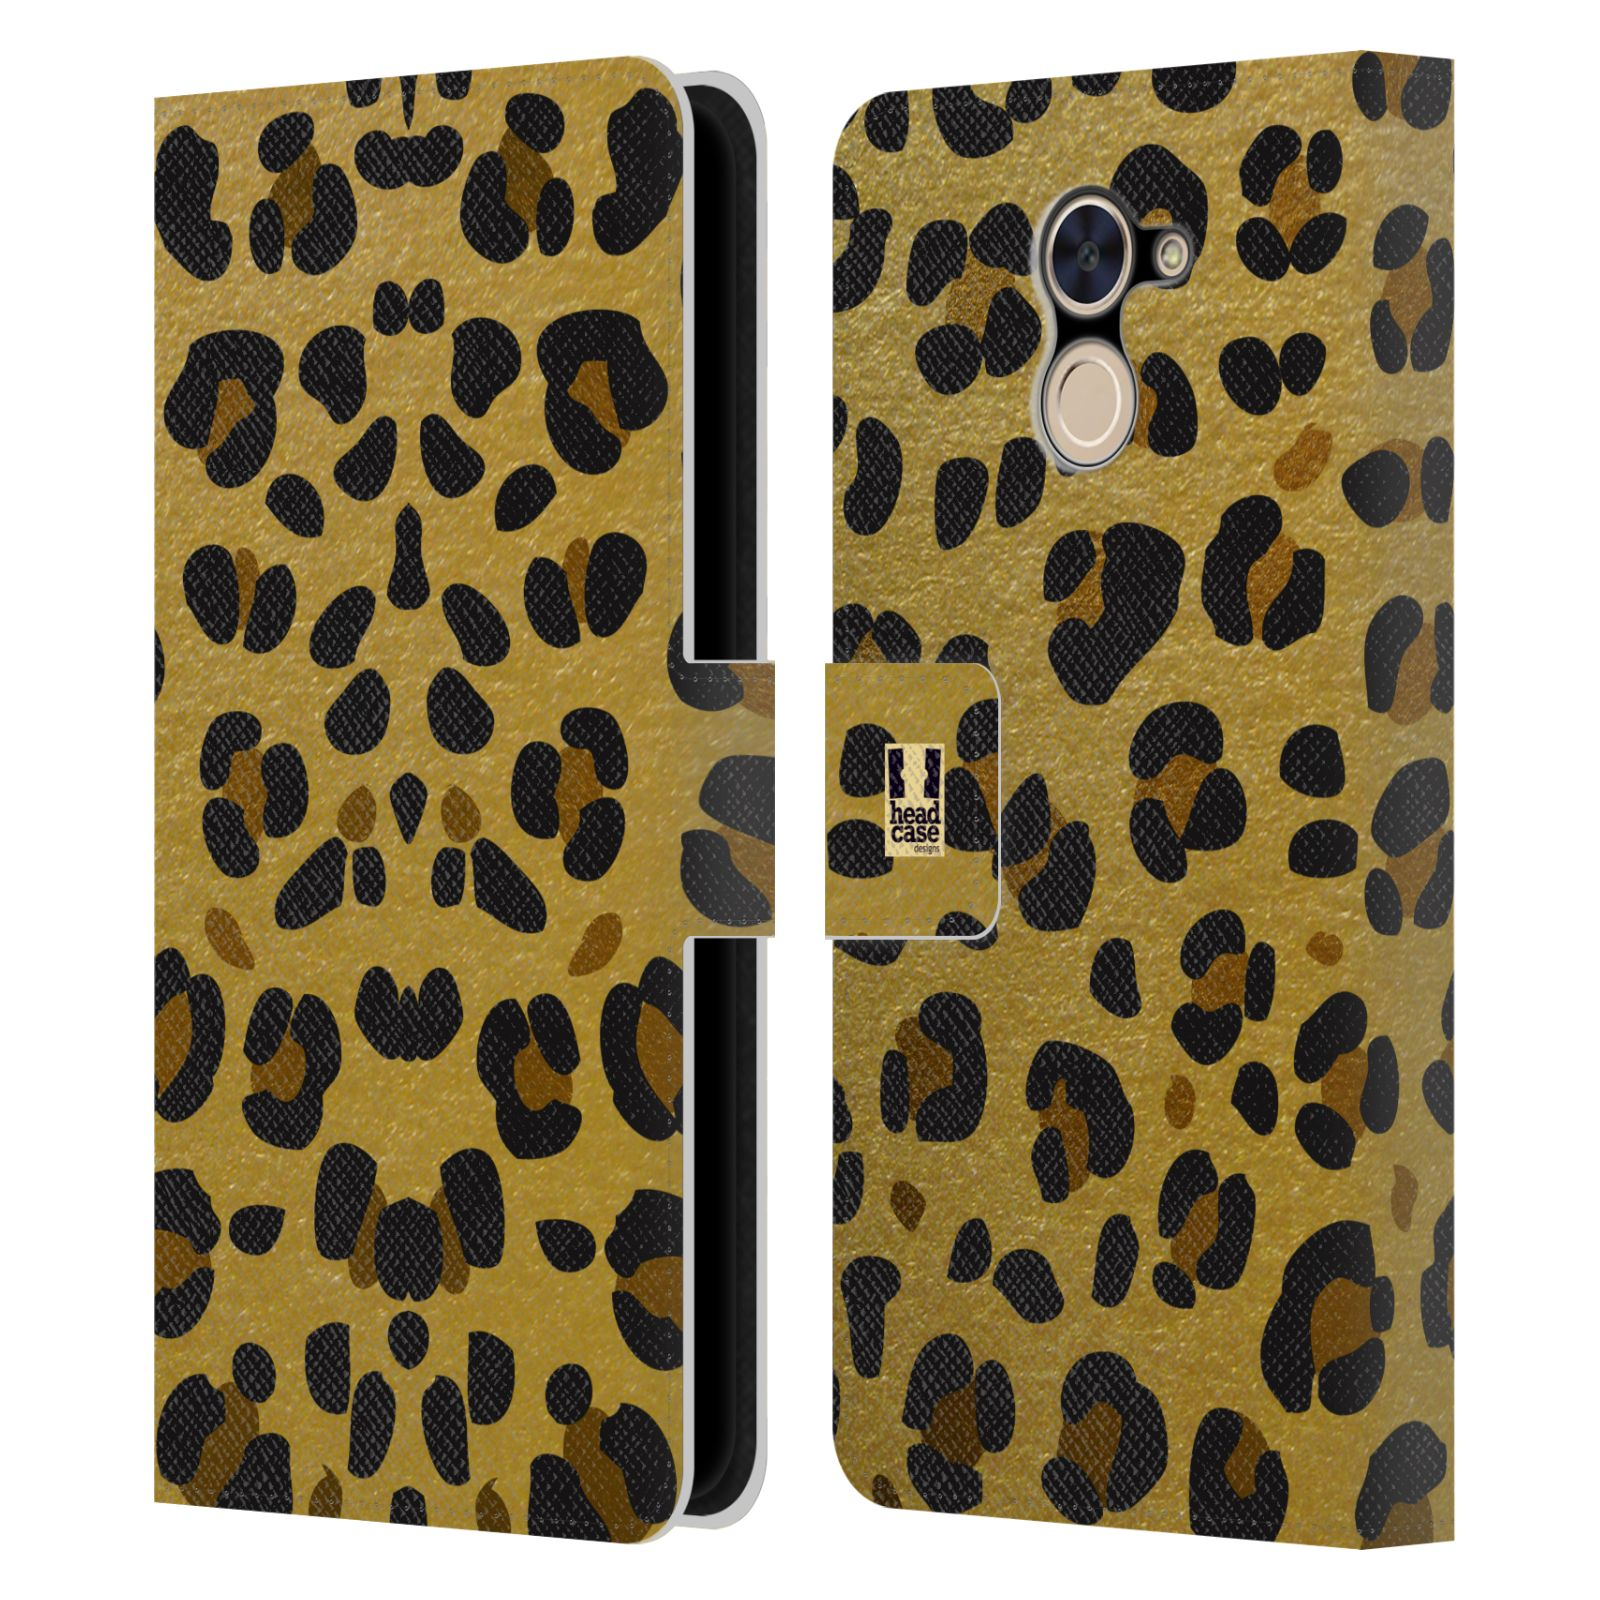 Pouzdro na mobil Huawei Y7 / Y7 Prime - Head Case - Fashion zvířecí vzor